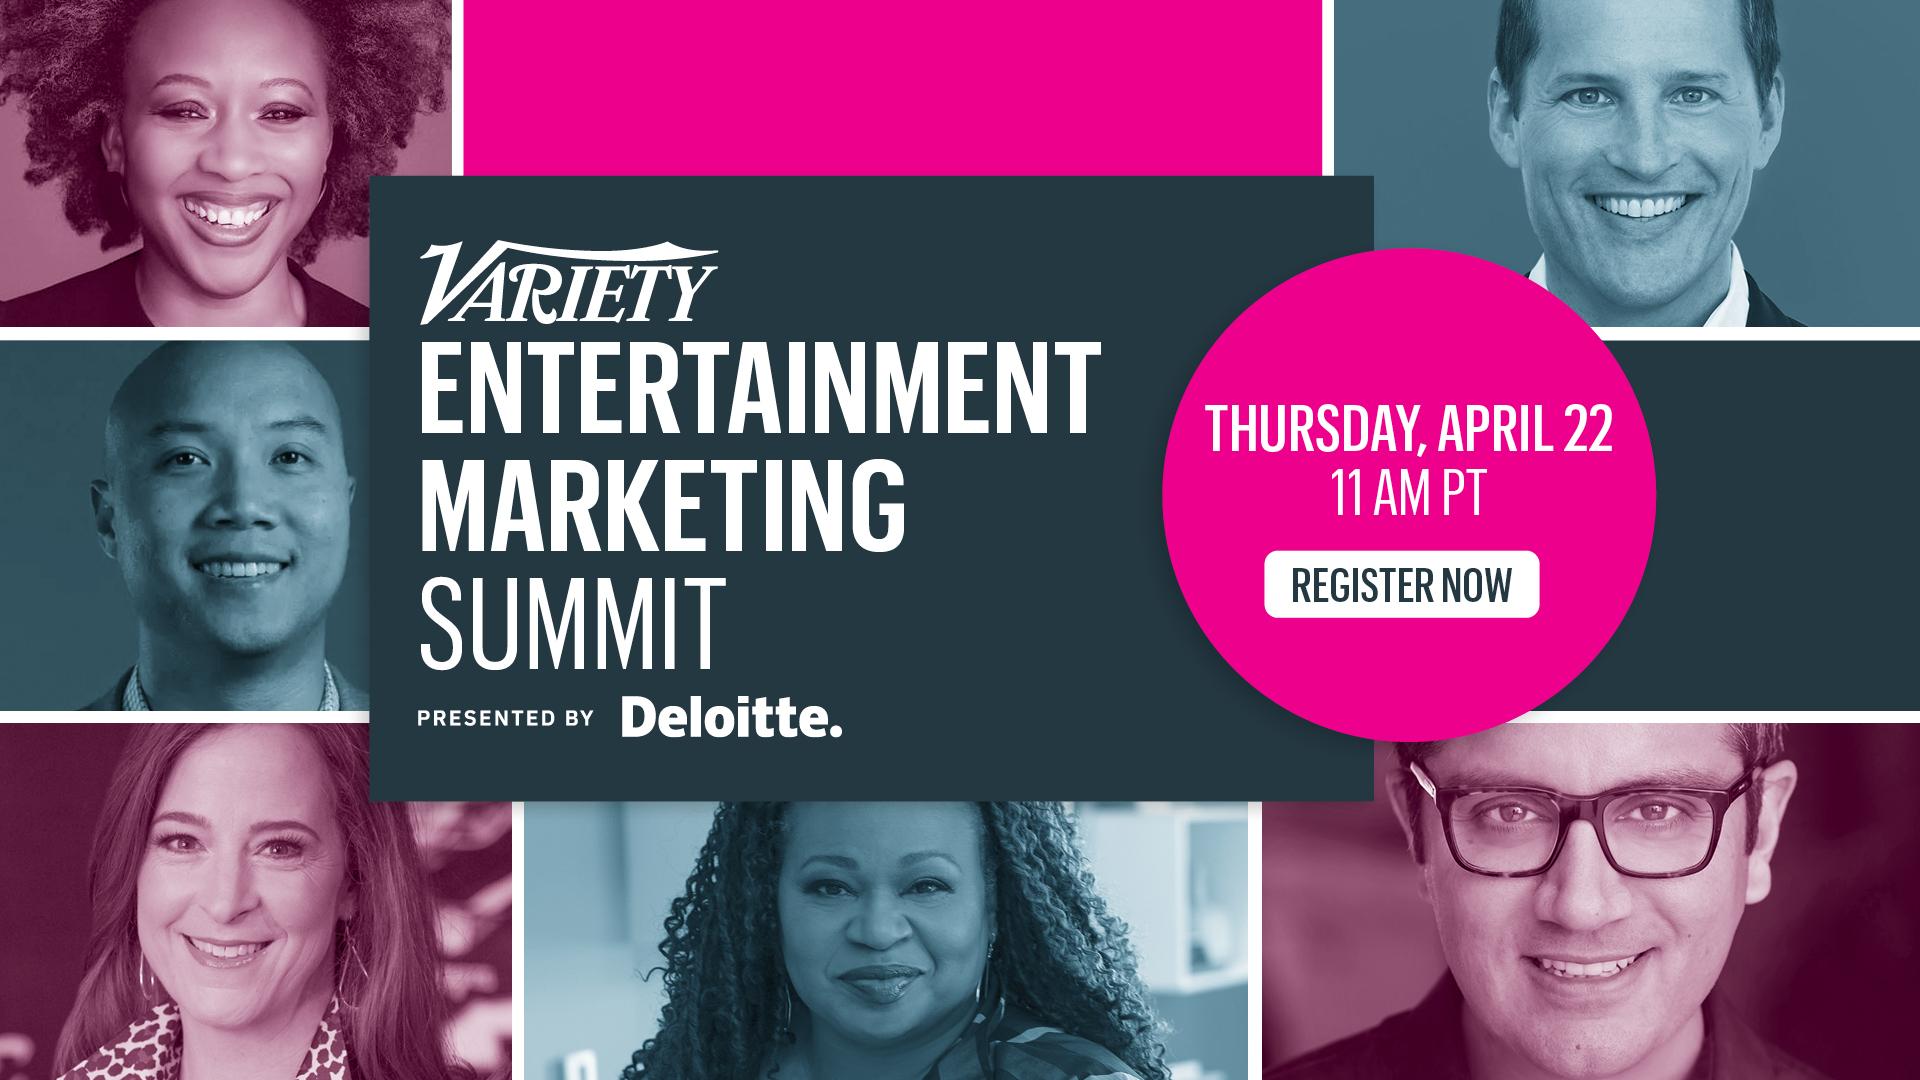 Amazon and Disney Marketing Heads to Keynote Variety Entertainment Marketing Summit